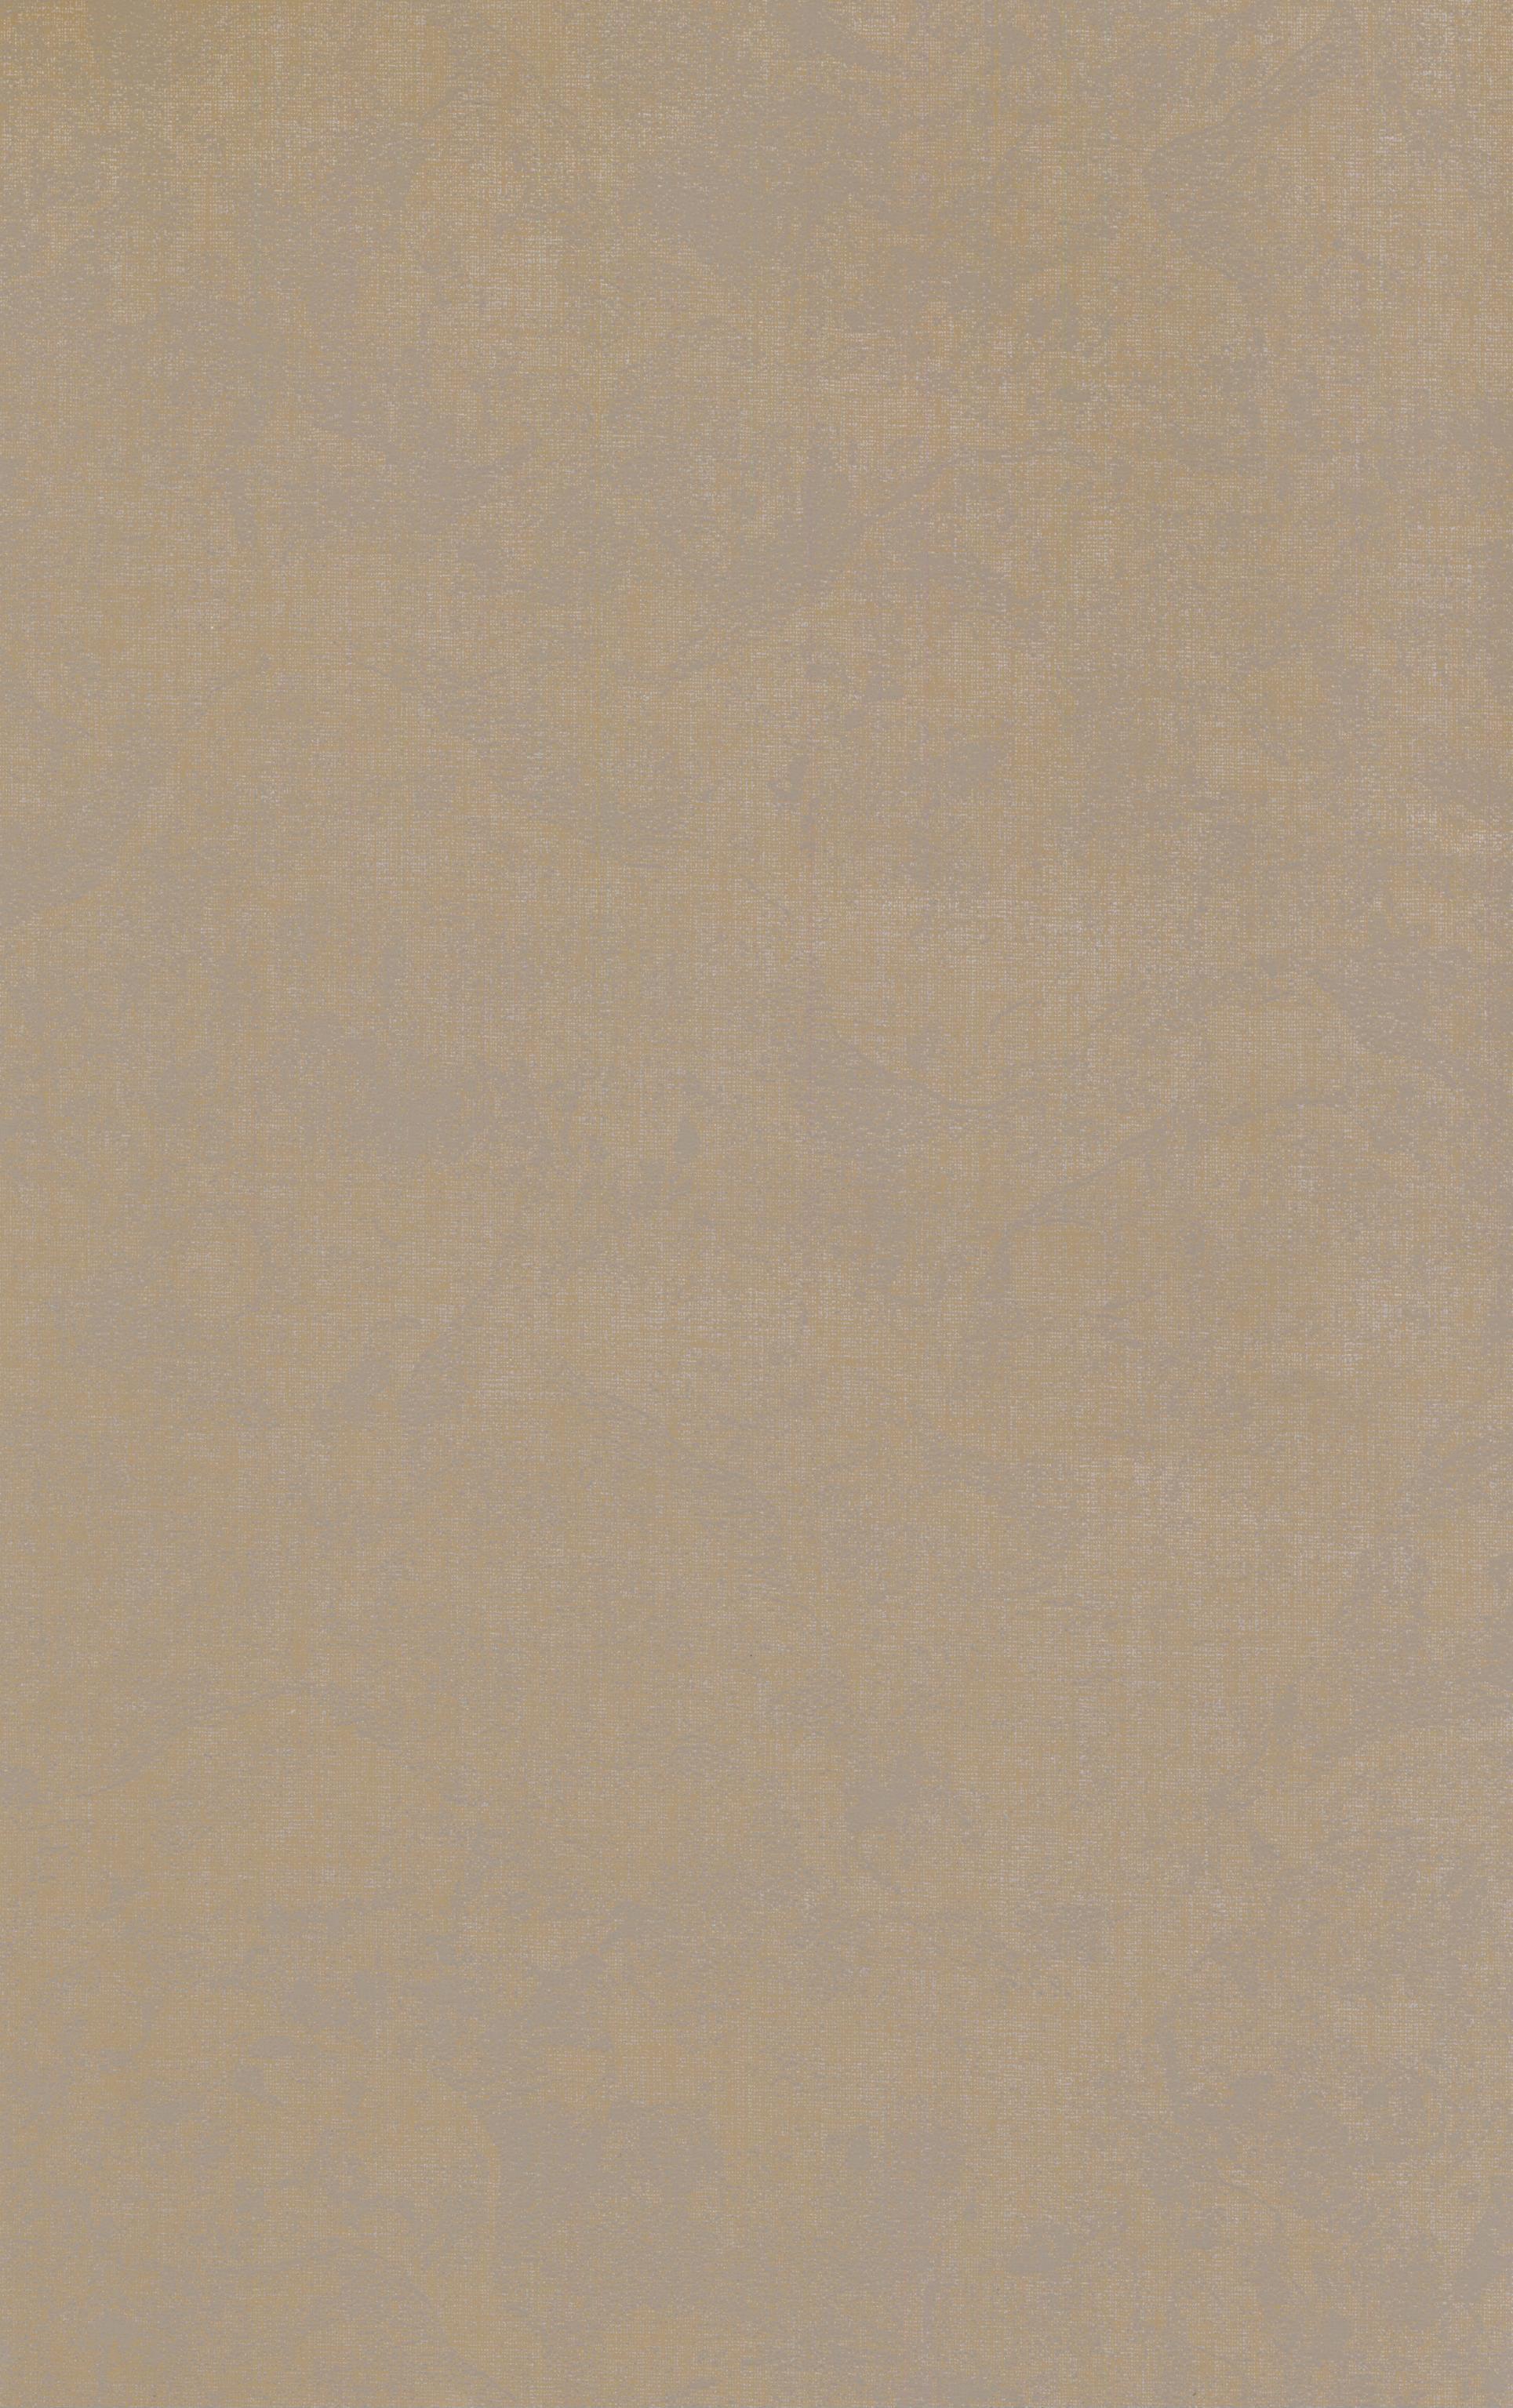 SOLID - Modern Prepasted Color Light Brown Wallpaper Roll